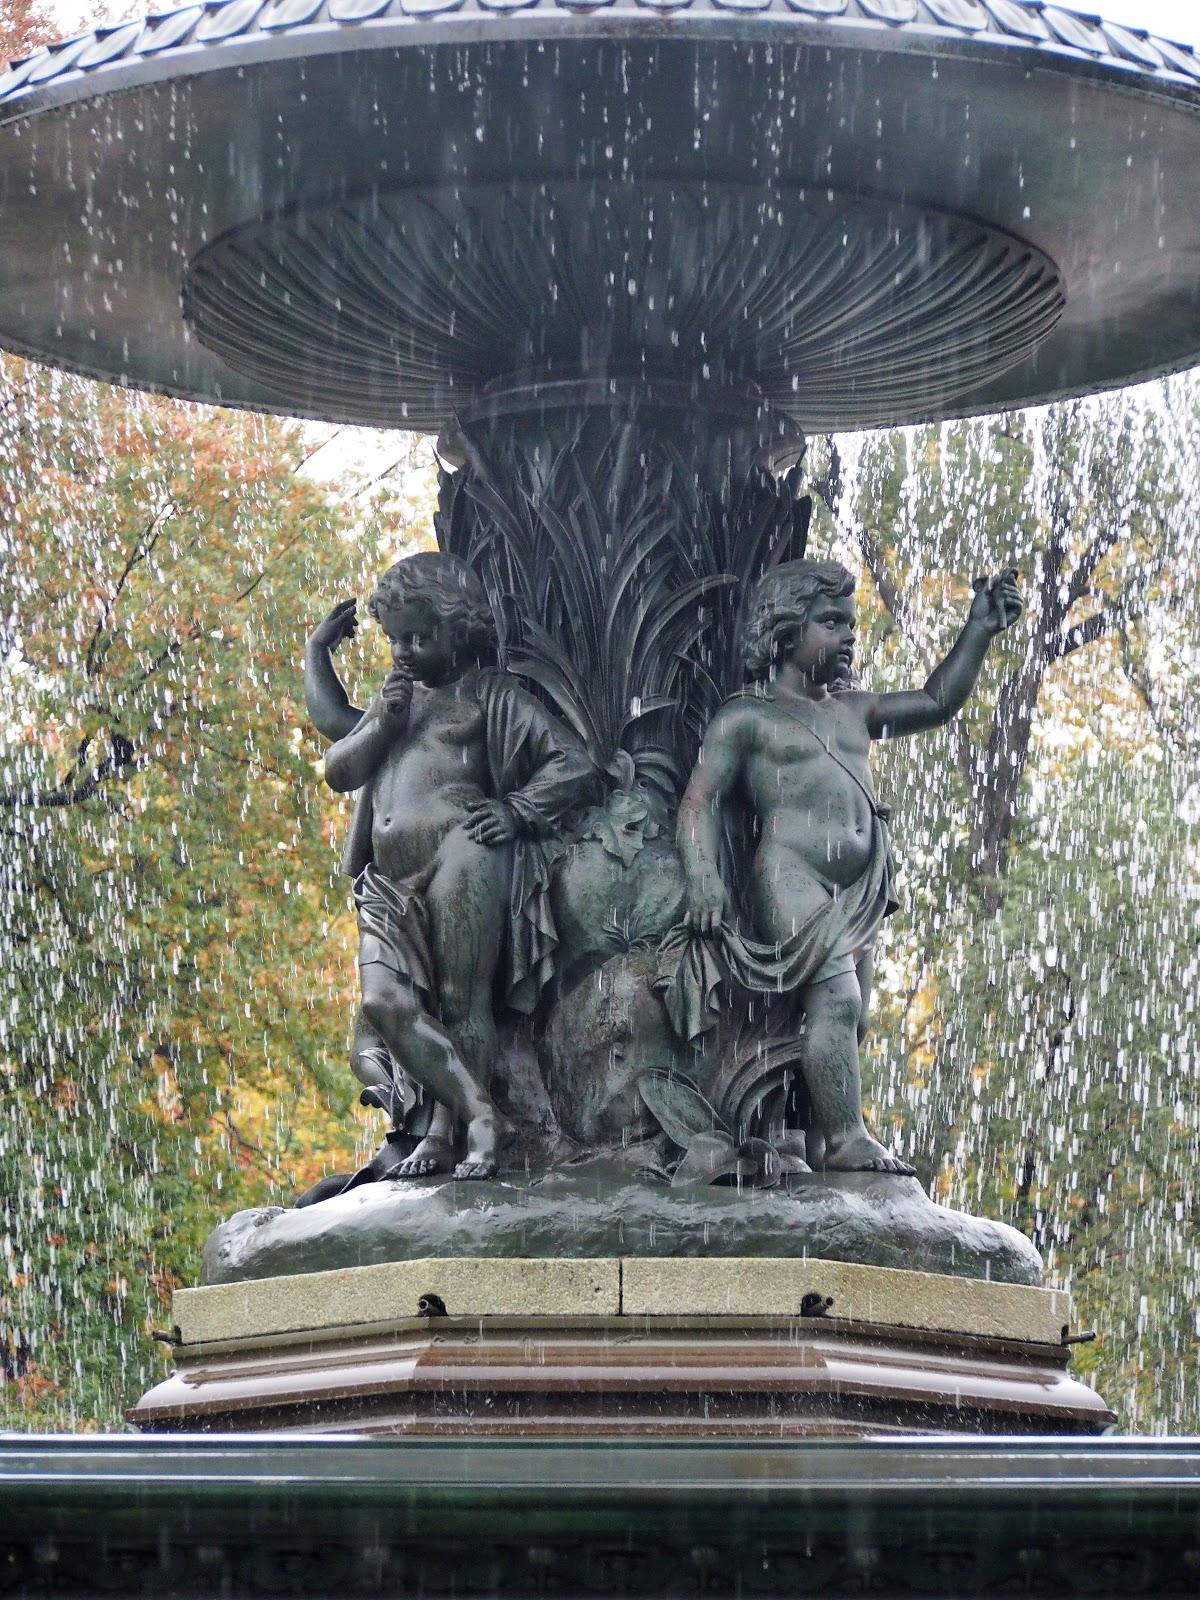 Bethesda Cherubs, #bethesdacherubs #centralpark #bethesdafountain #fountain 2014